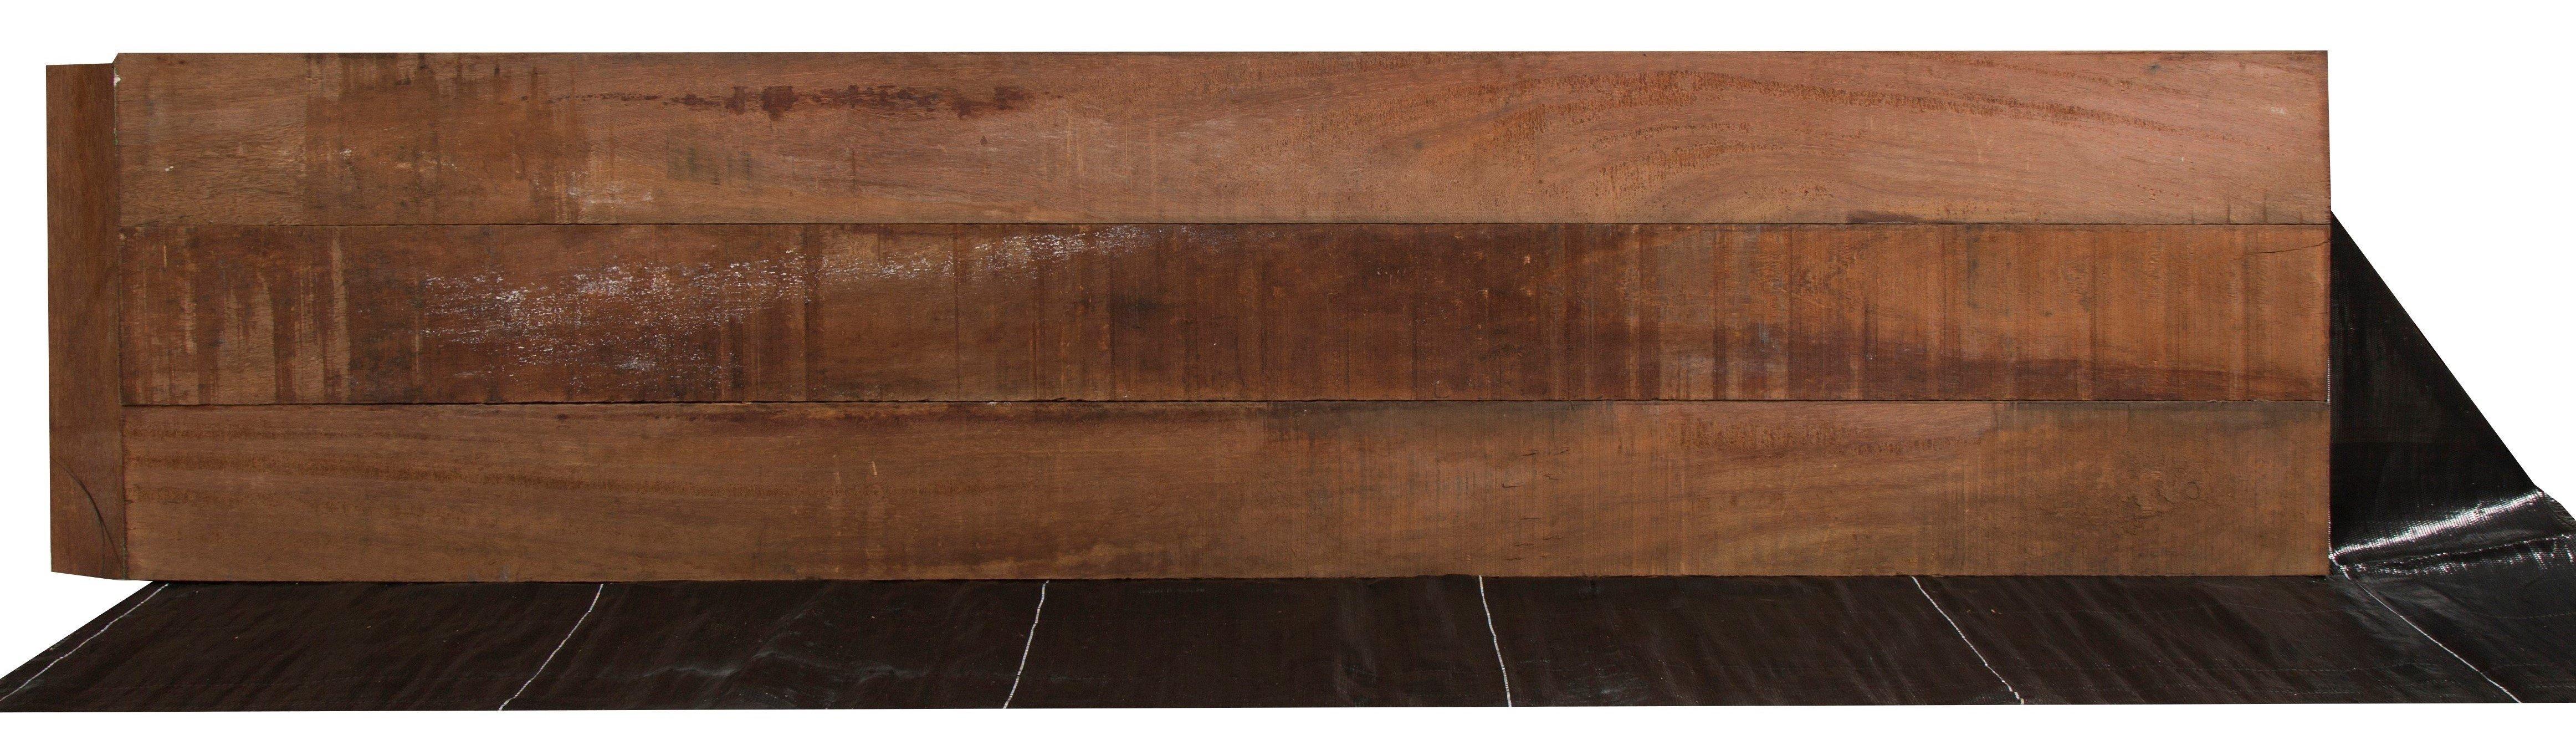 Houten Beschoeingsschotten 60 x 250 cm. Type: Azobe